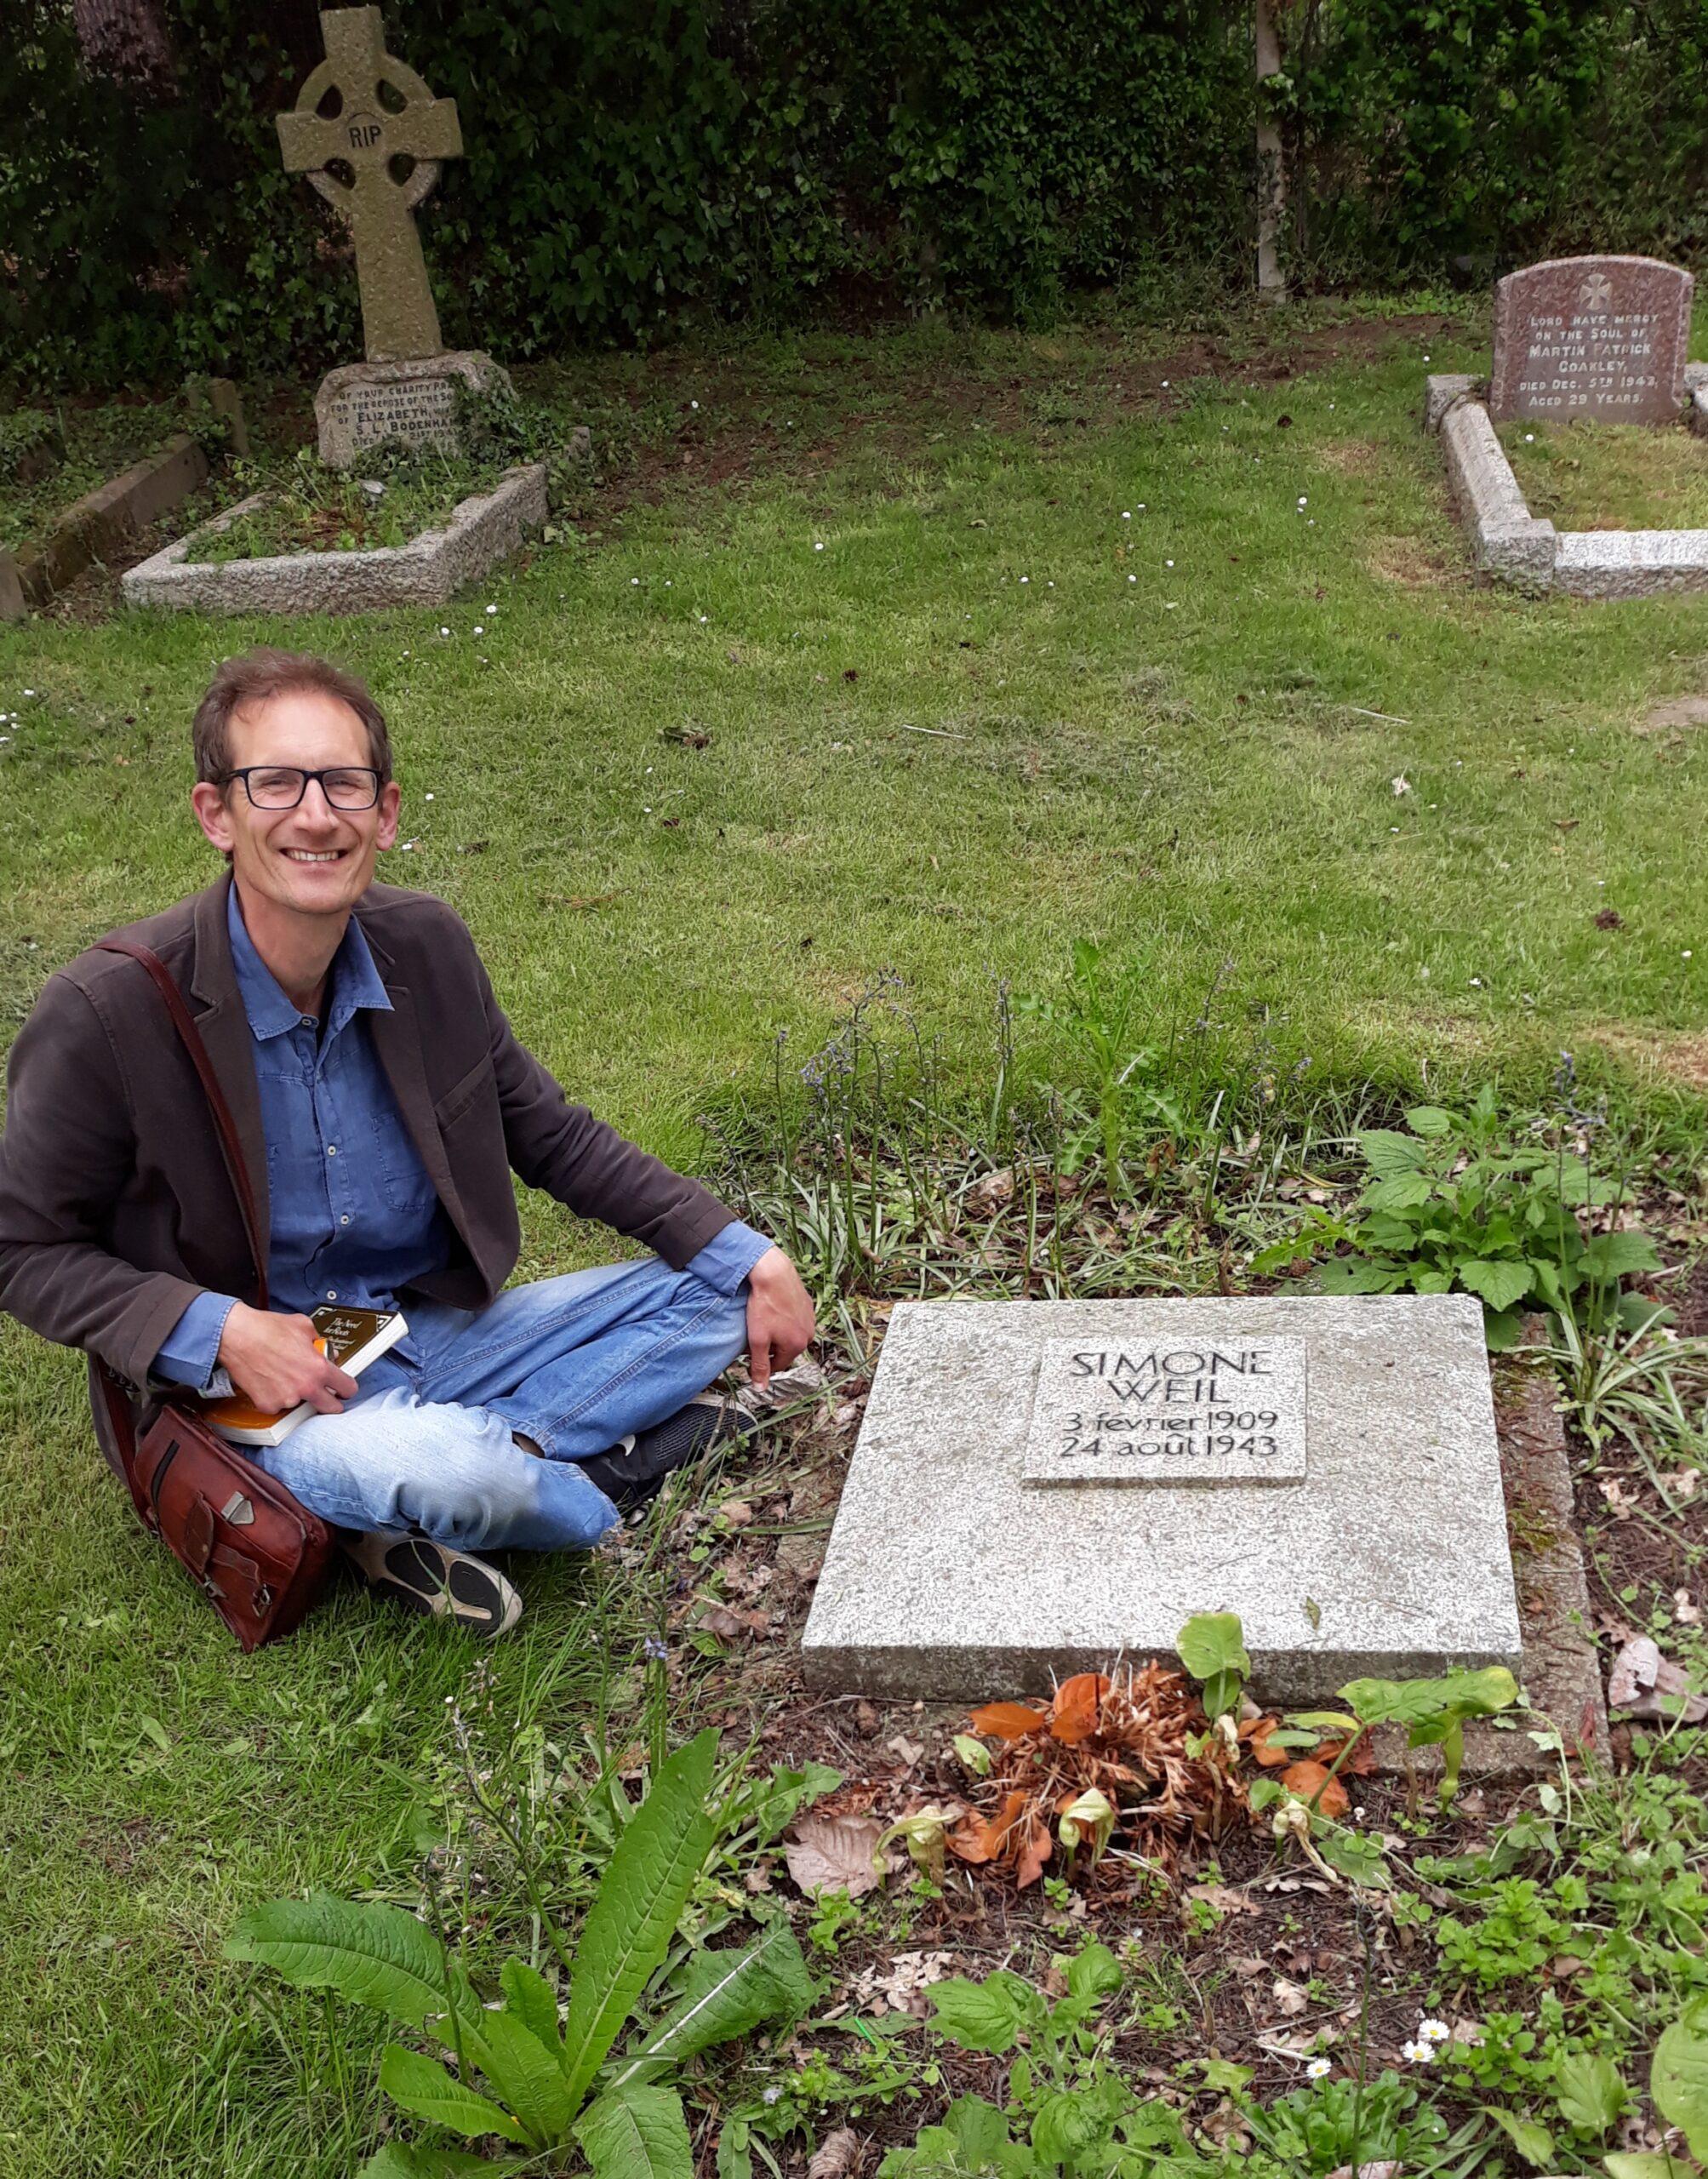 Stefan at Simone Weil grave